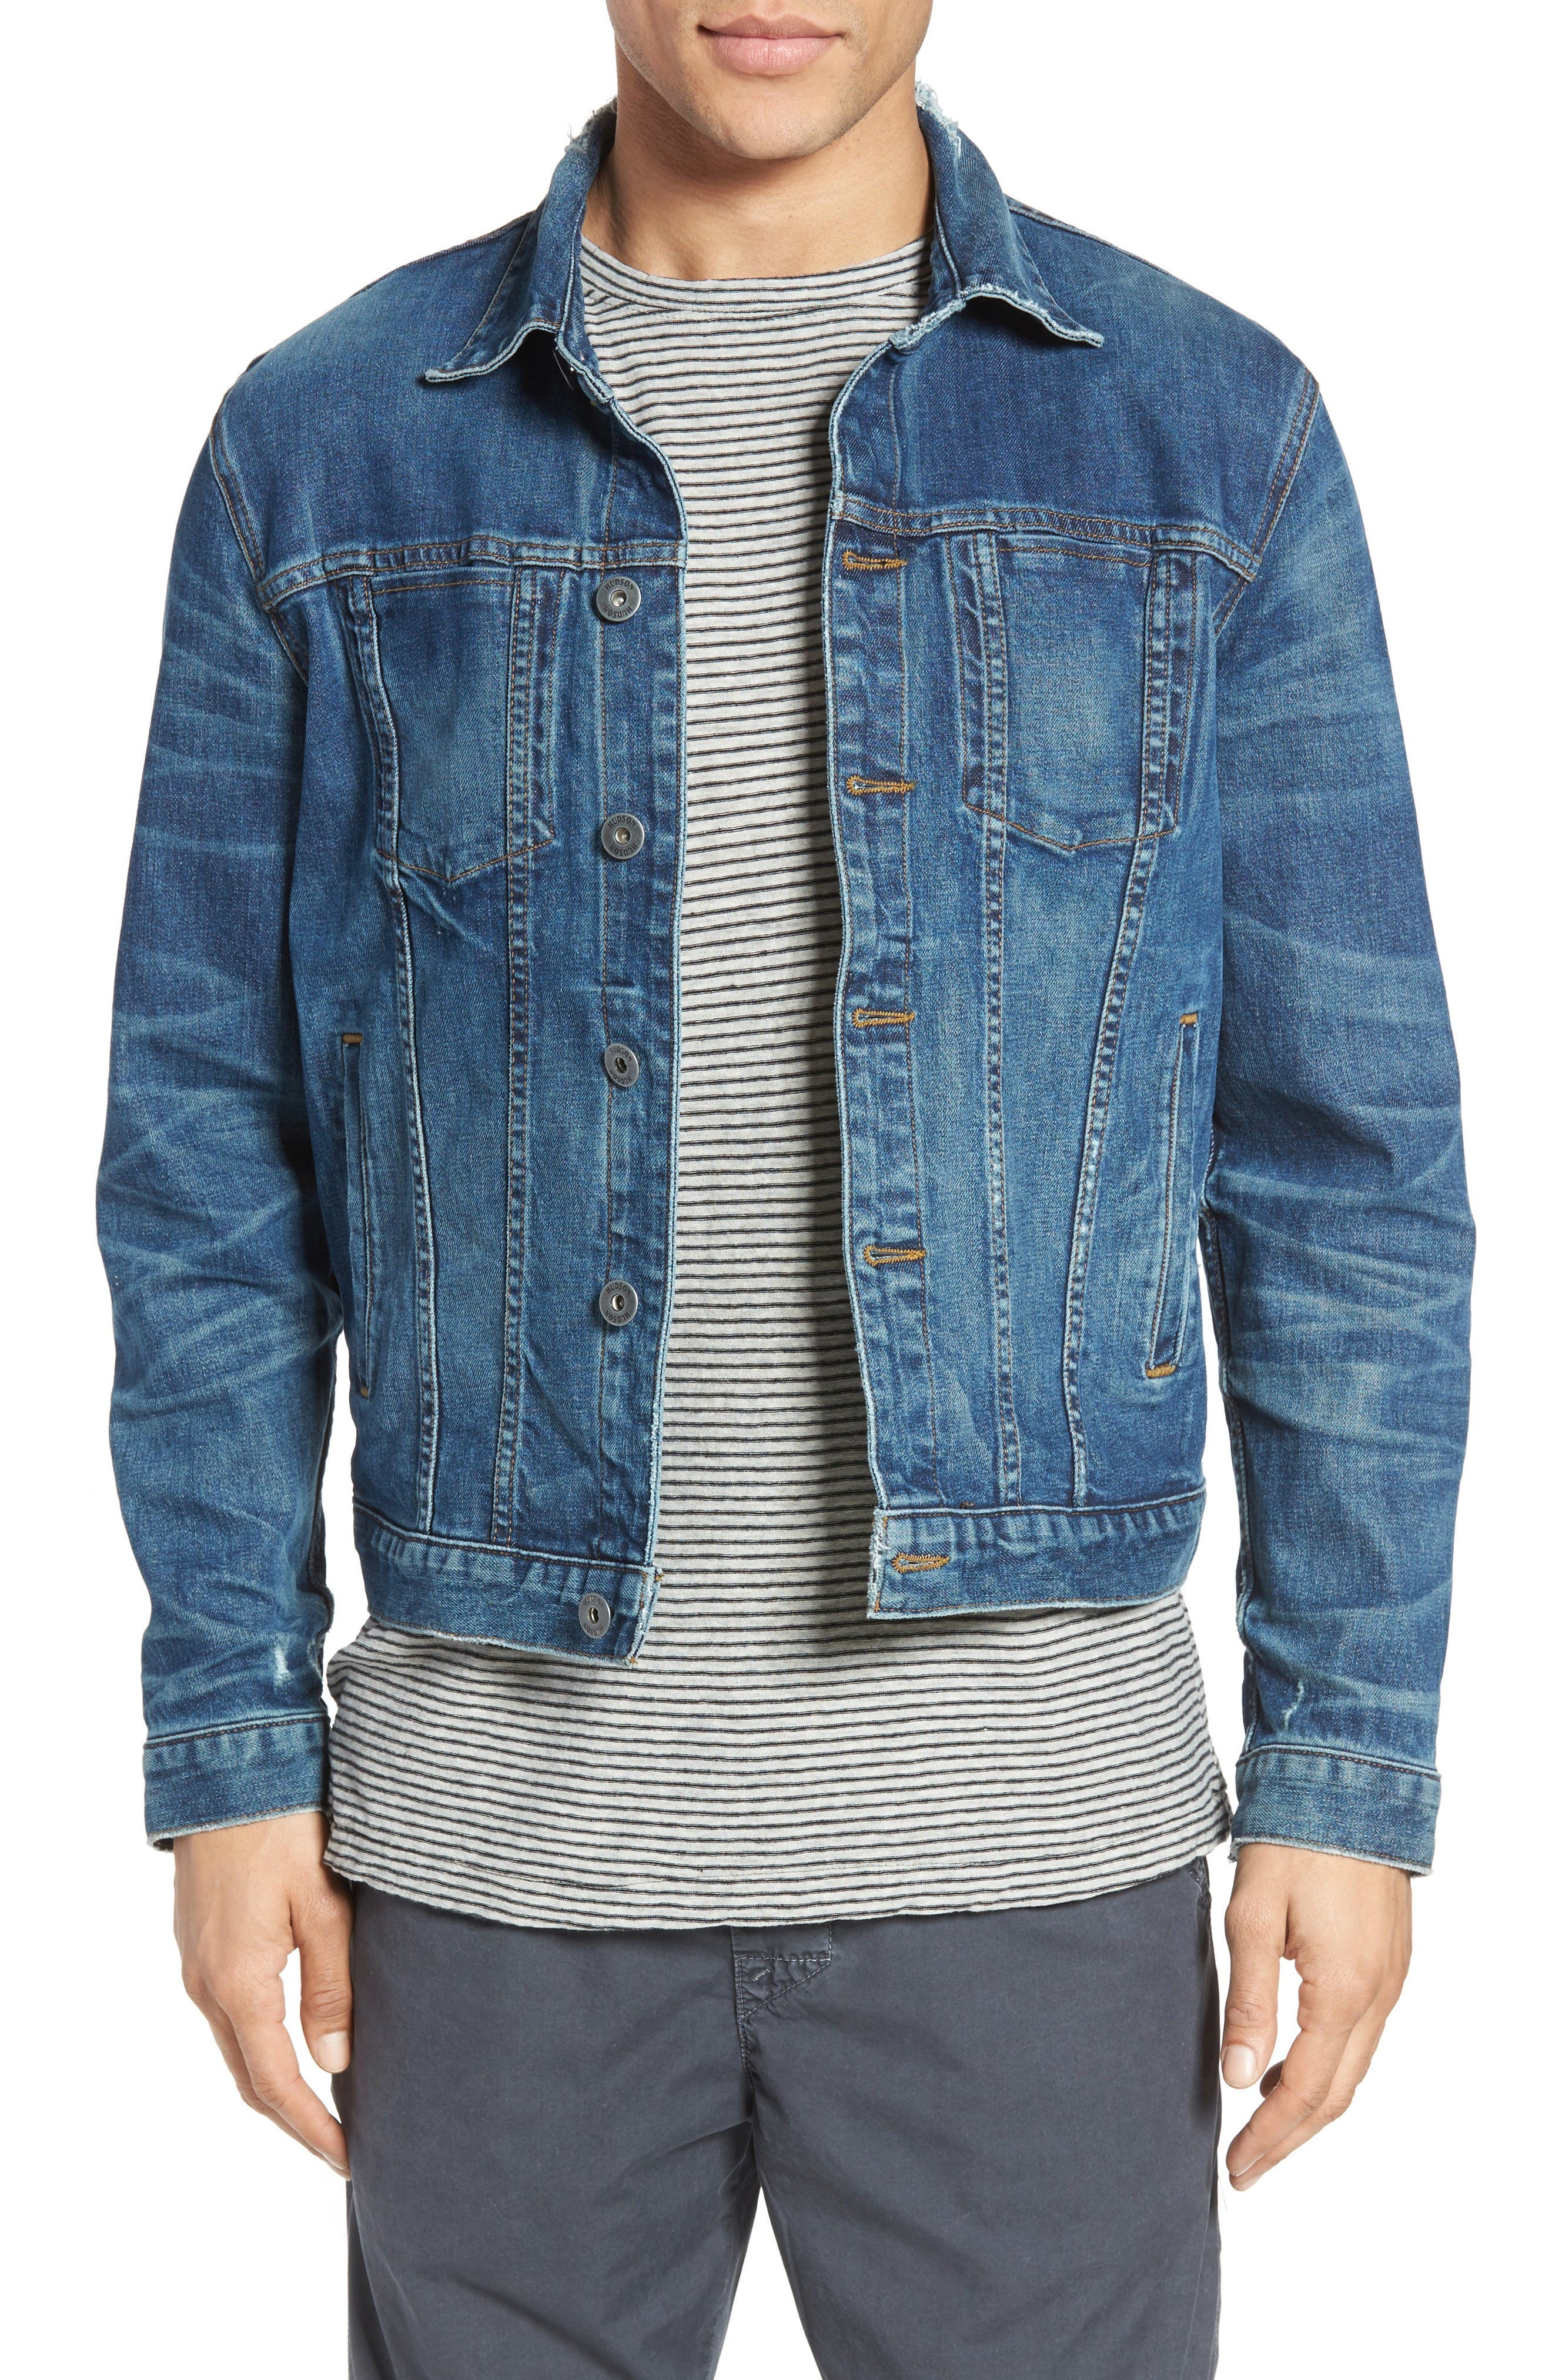 Main Image - Hudson Jeans Broc Denim Jacket